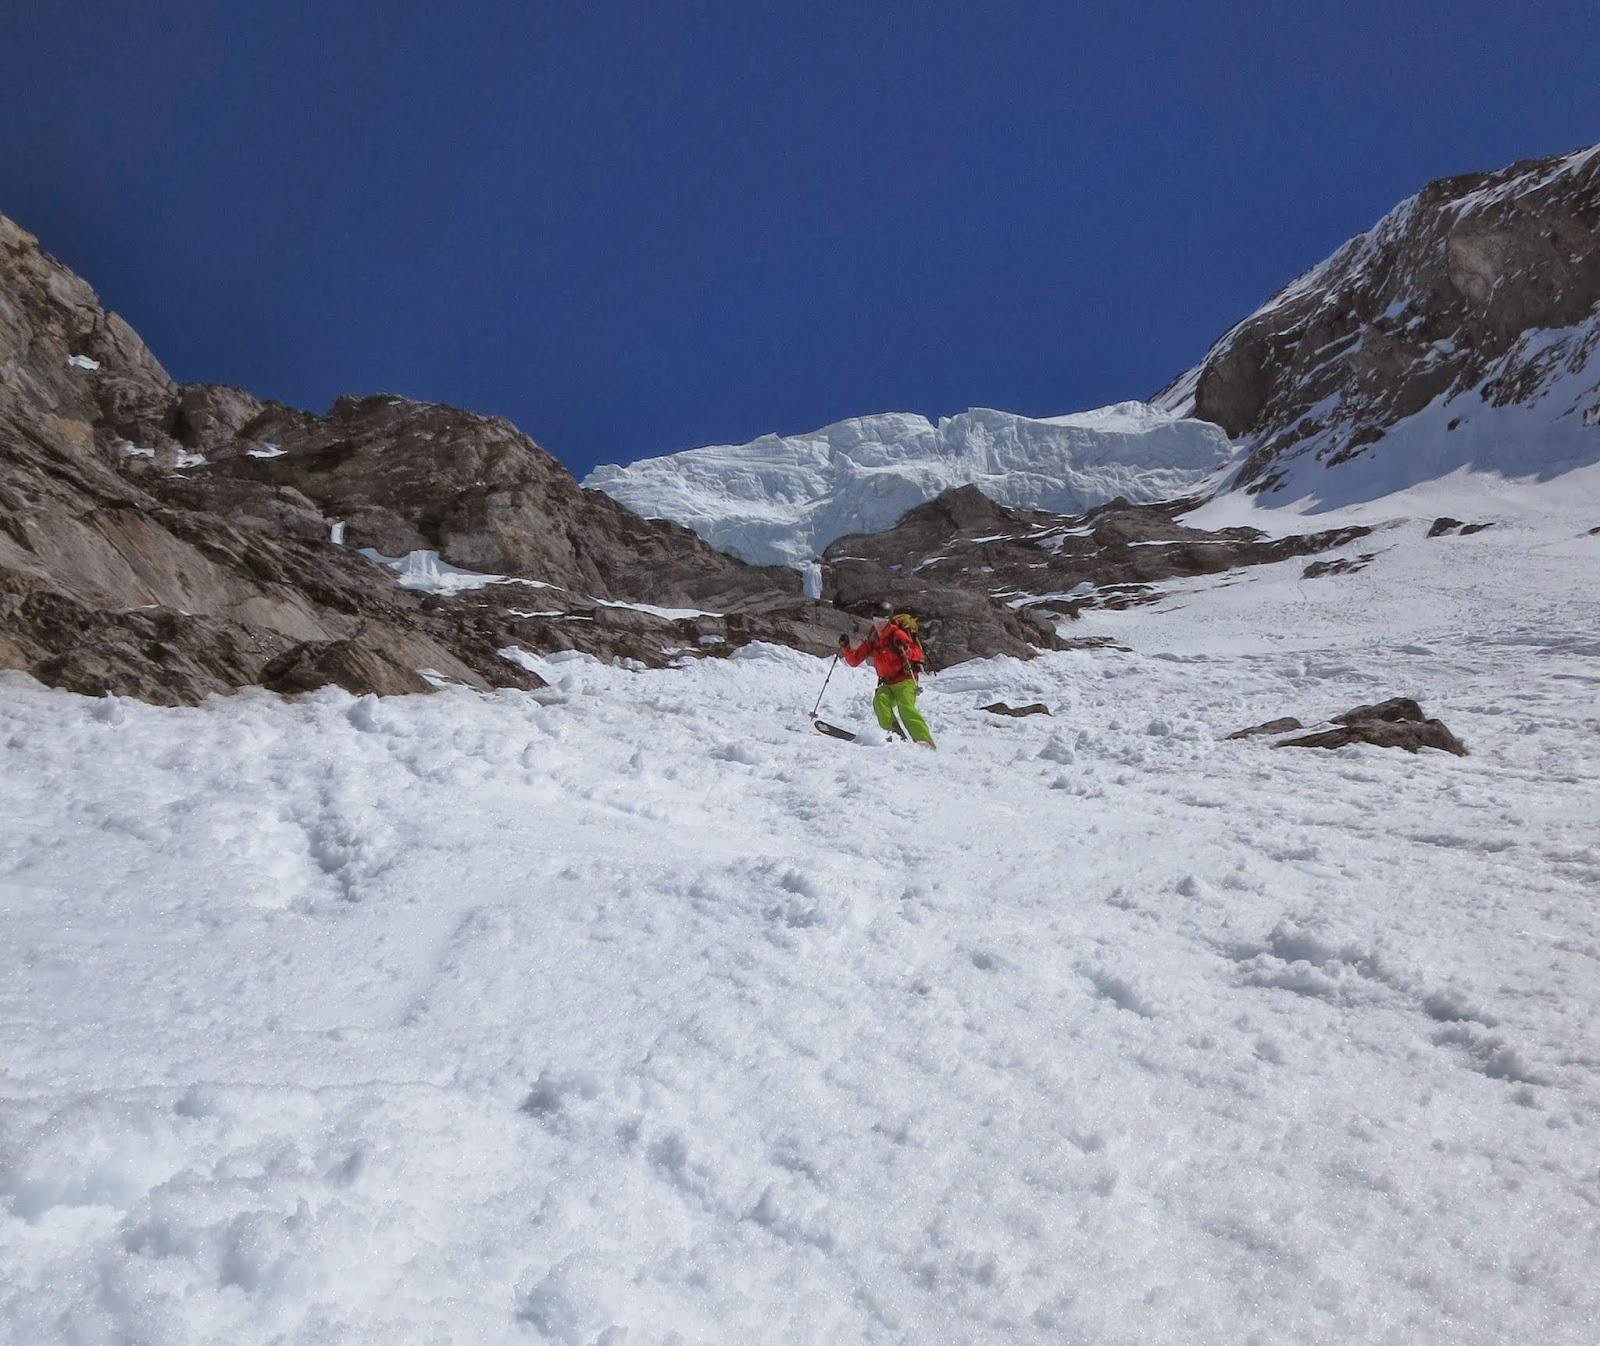 Below the Eiger serac & Scottish Climbers: Un-pisted Alpine: 3 Days of Steep Skiing